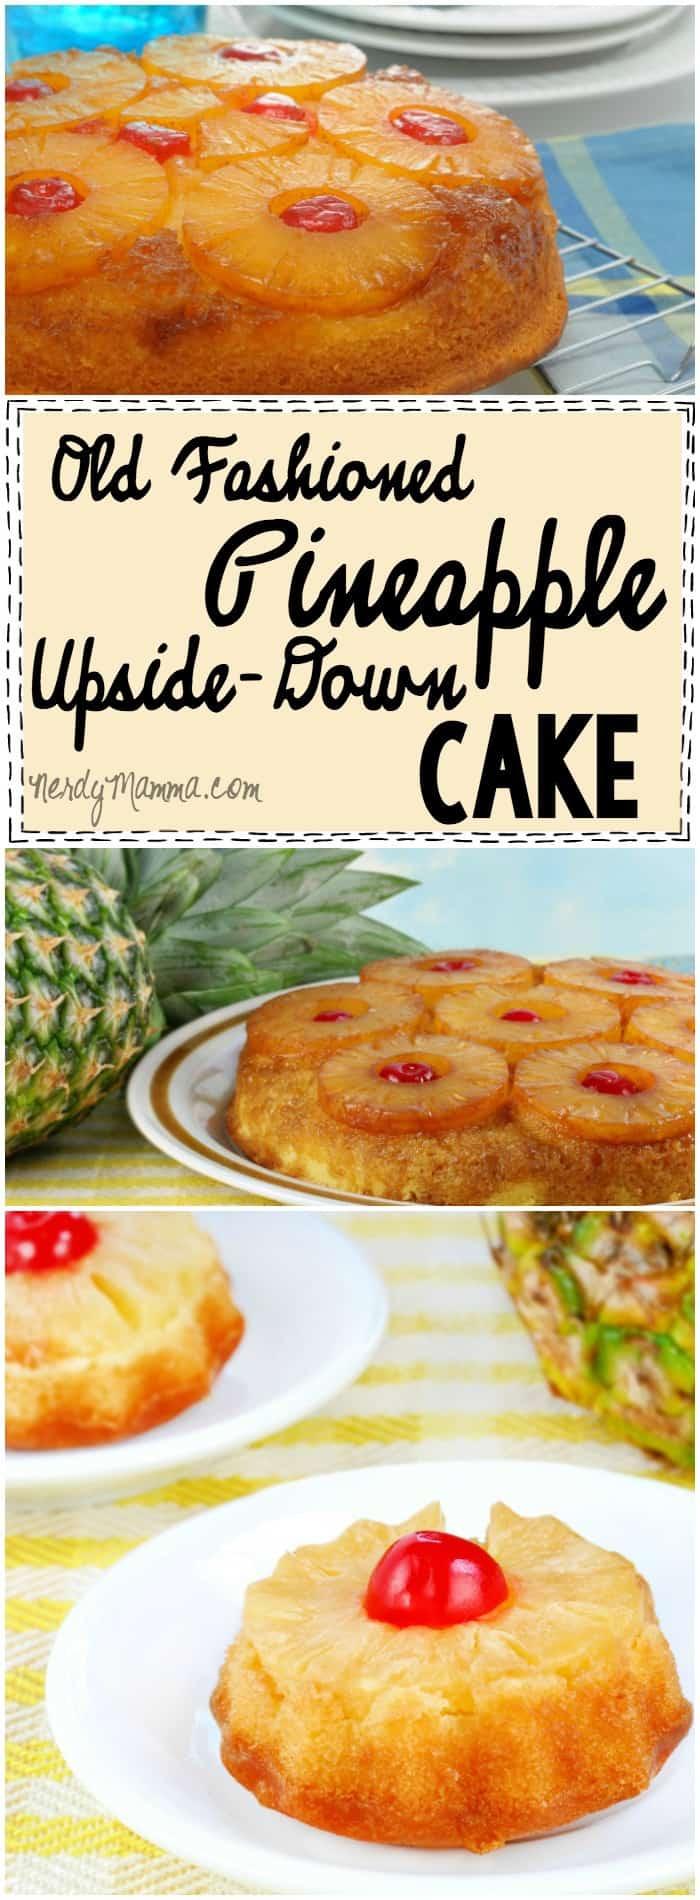 Recipe Pineapple Upside Down Cake Drink